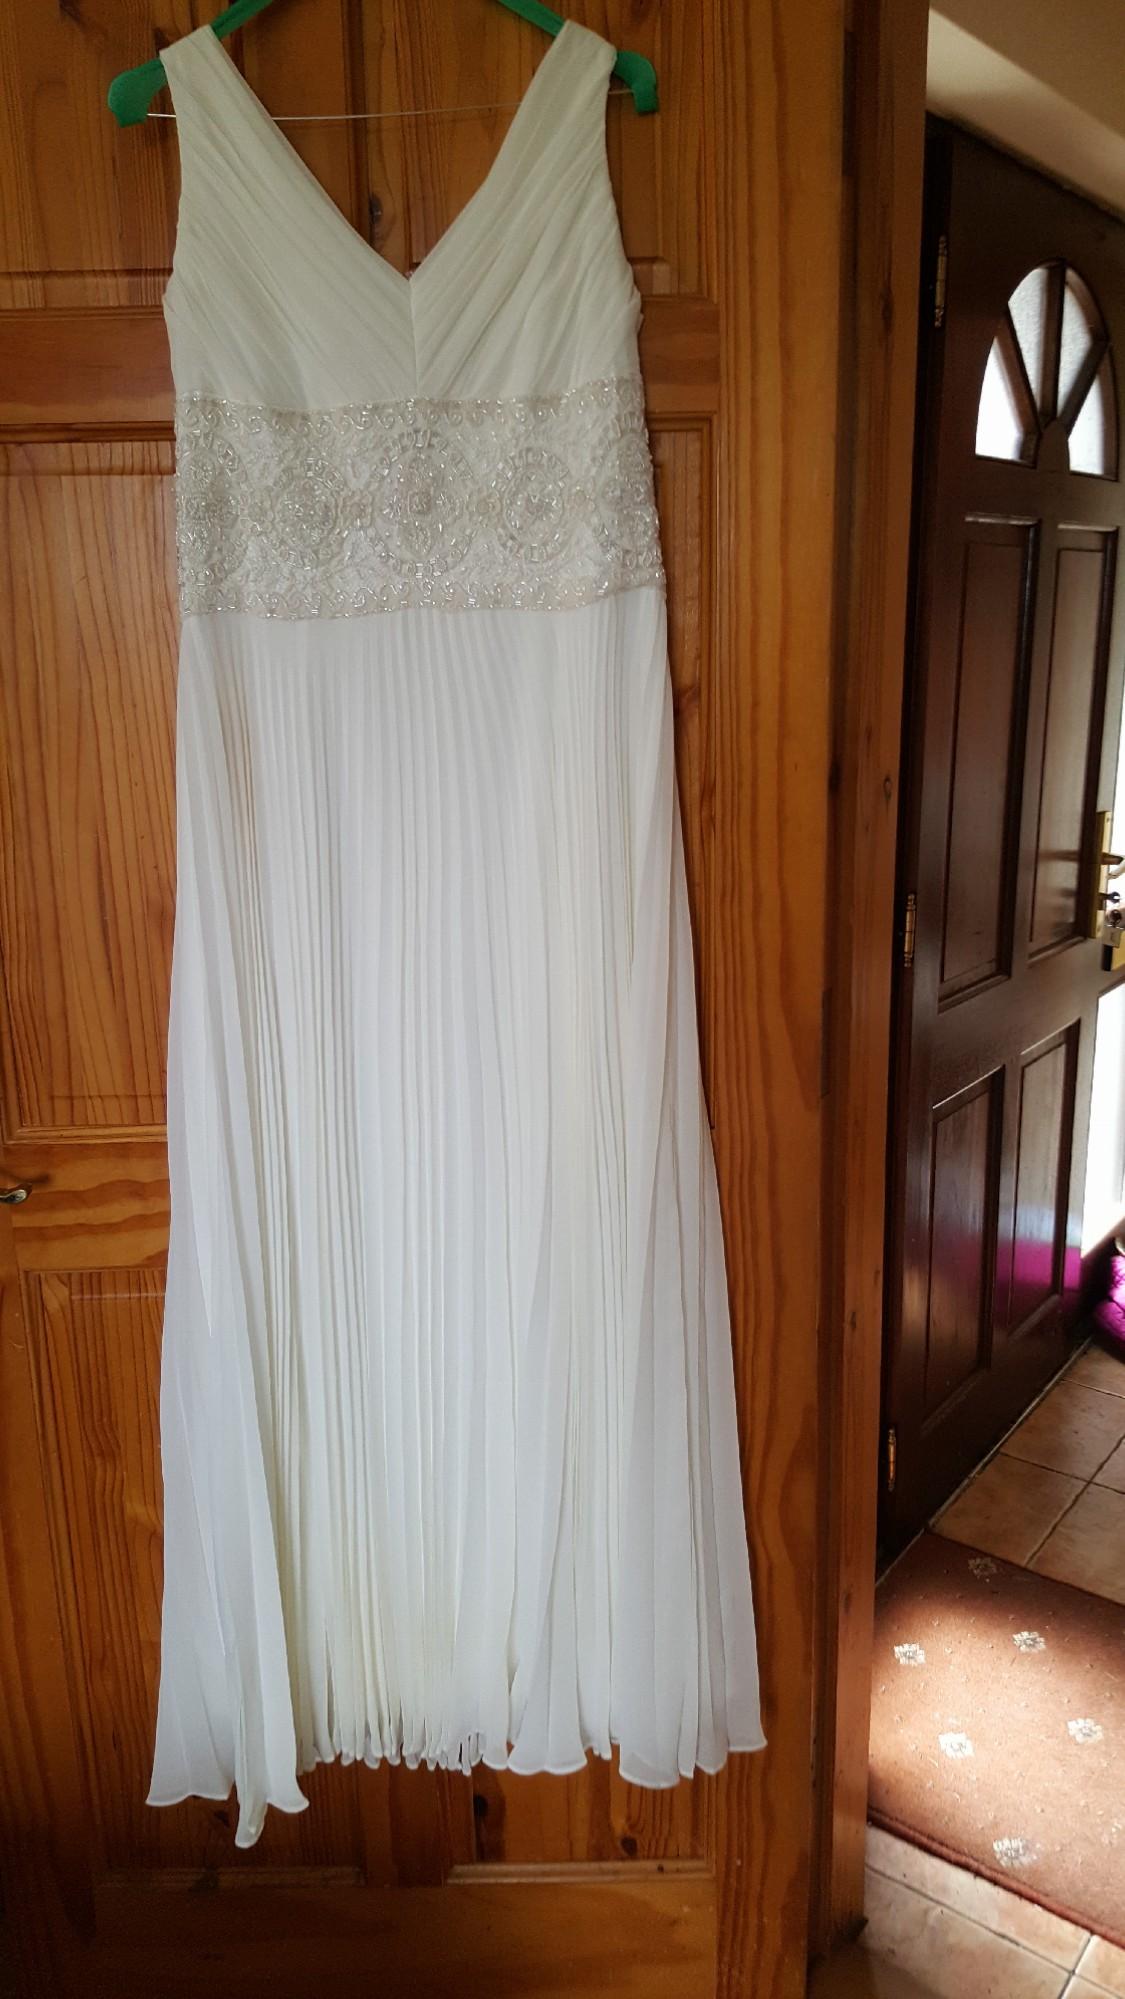 Johanna hehir second hand wedding dress on sale 44 off for Second hand wedding dresses london